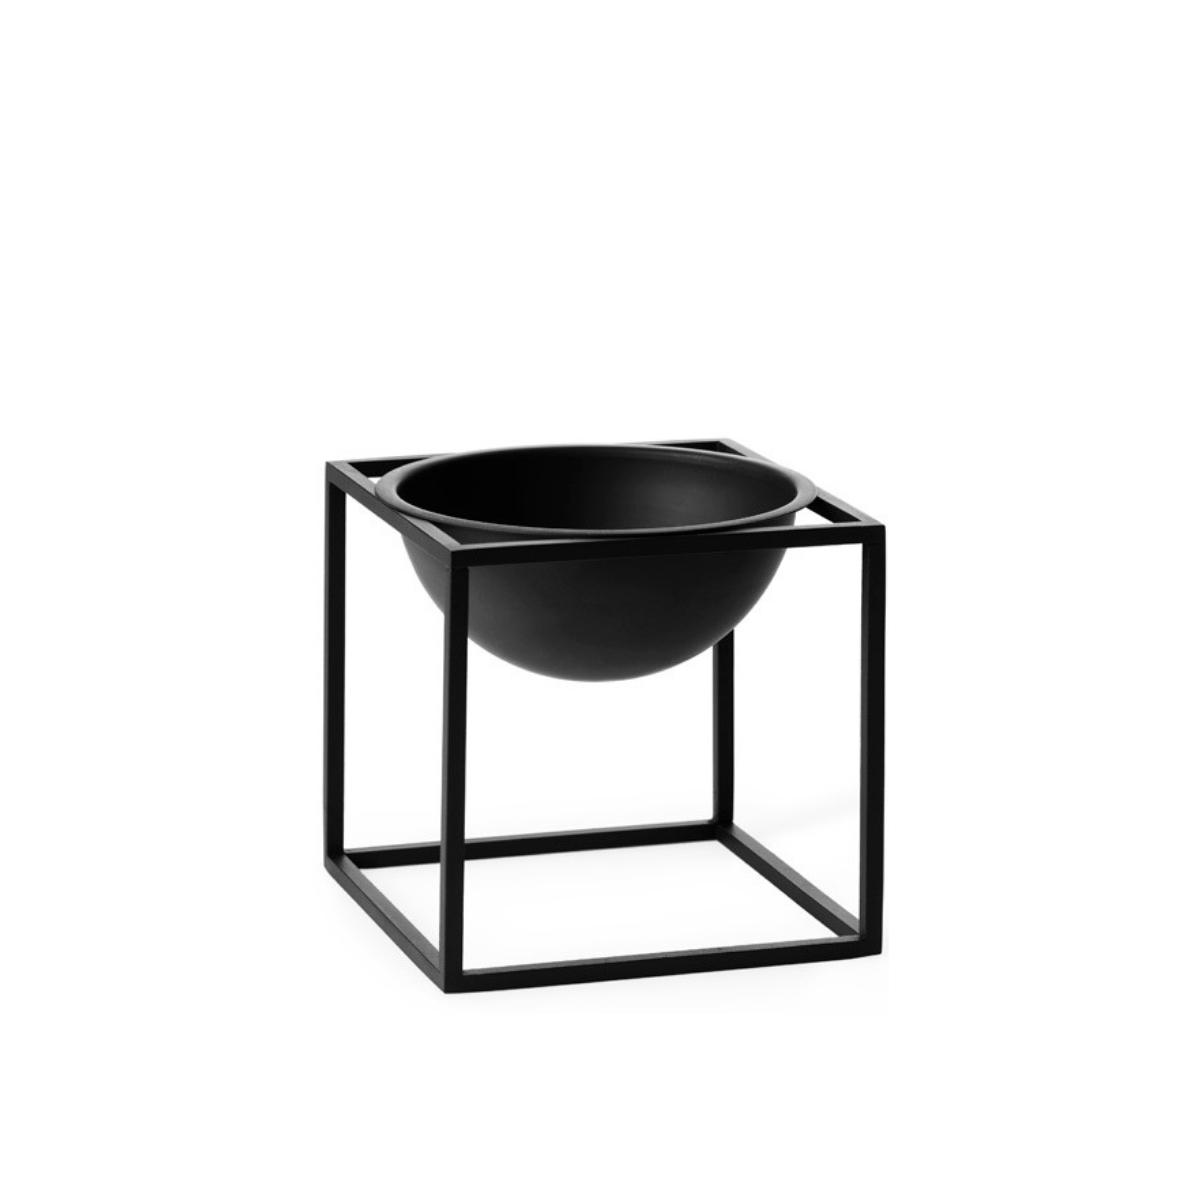 By Lassen   Kubus Bowl - Small - Bolighuset Werenberg